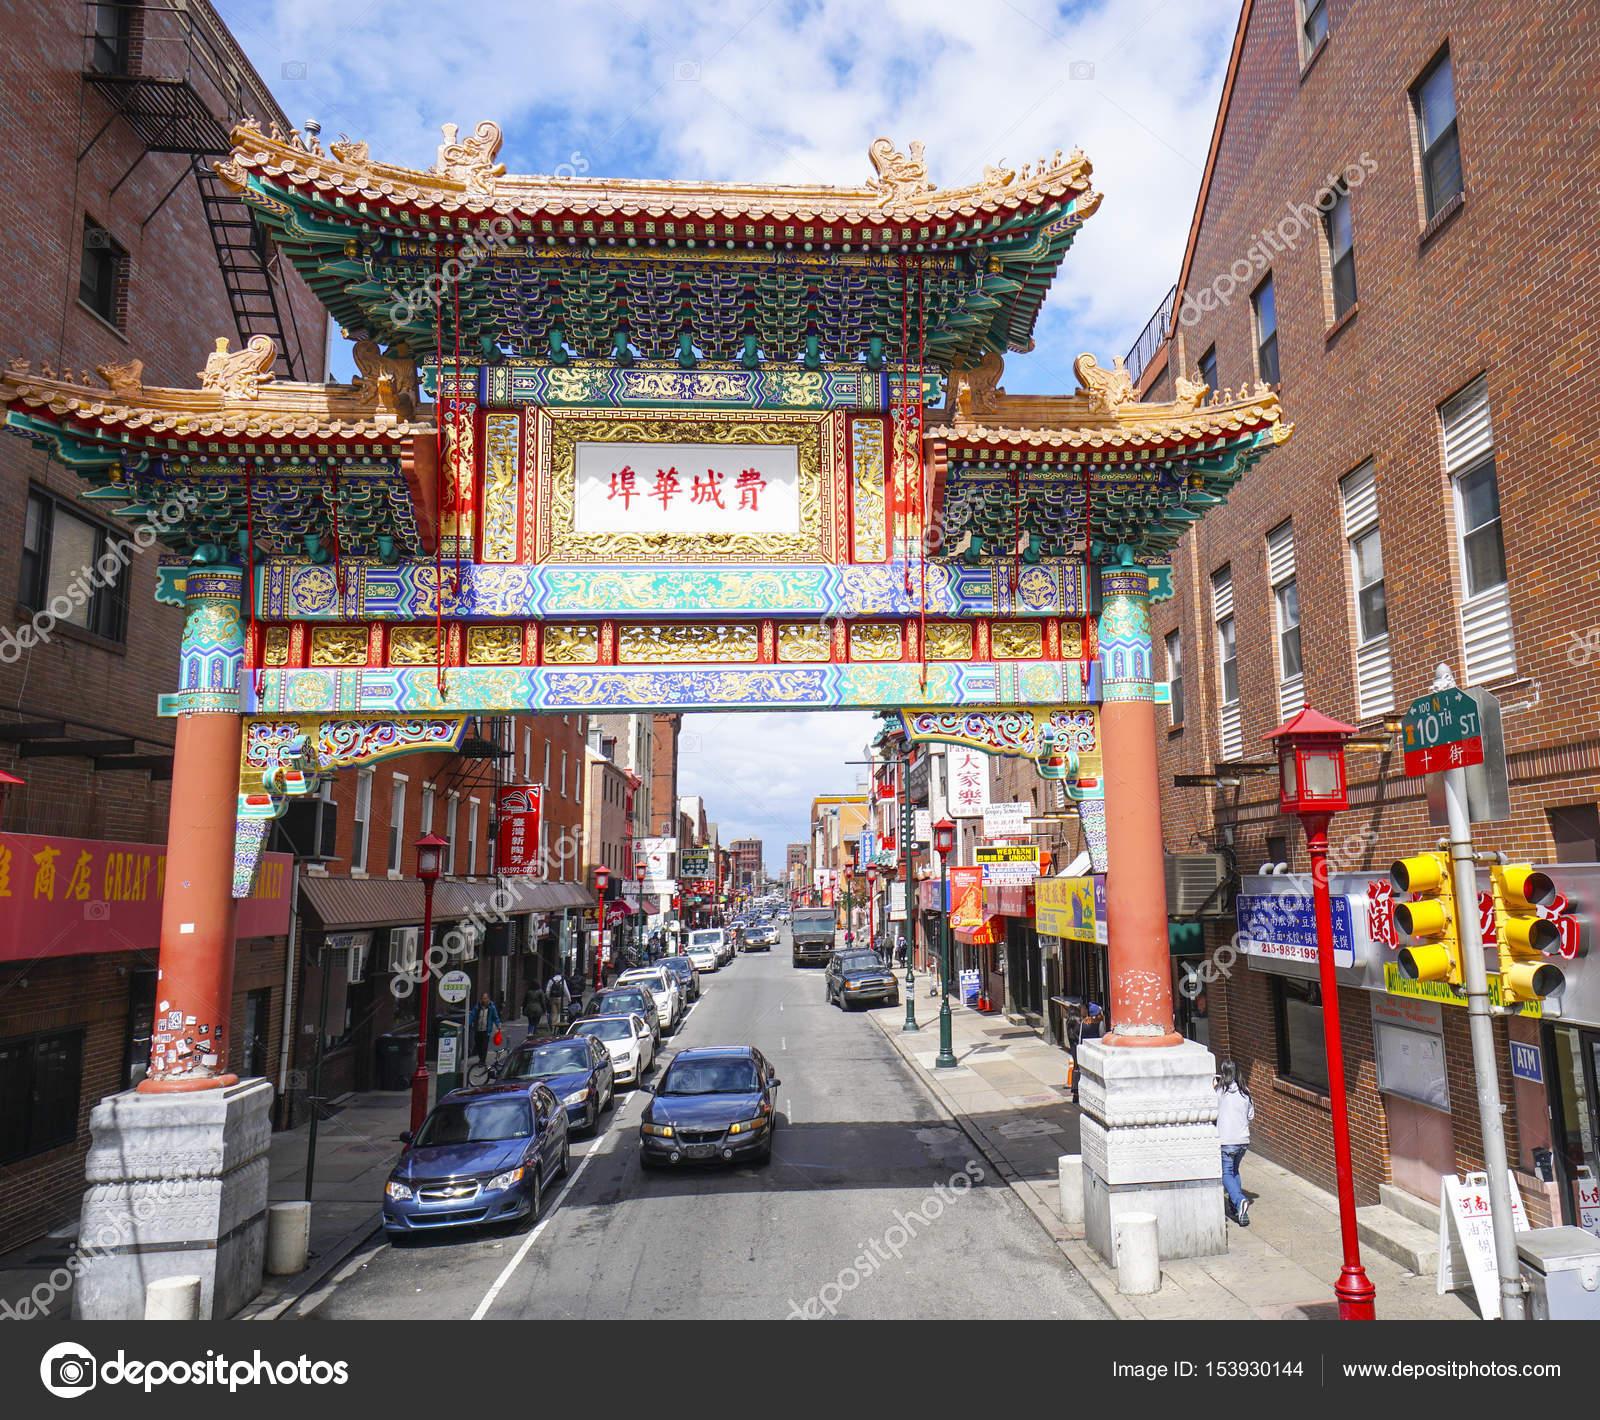 Beautiful Gate To Chinatown In Philadelphia Philadelphia Pennsylvania April 6 2017 Stock Editorial Photo C 4kclips 153930144